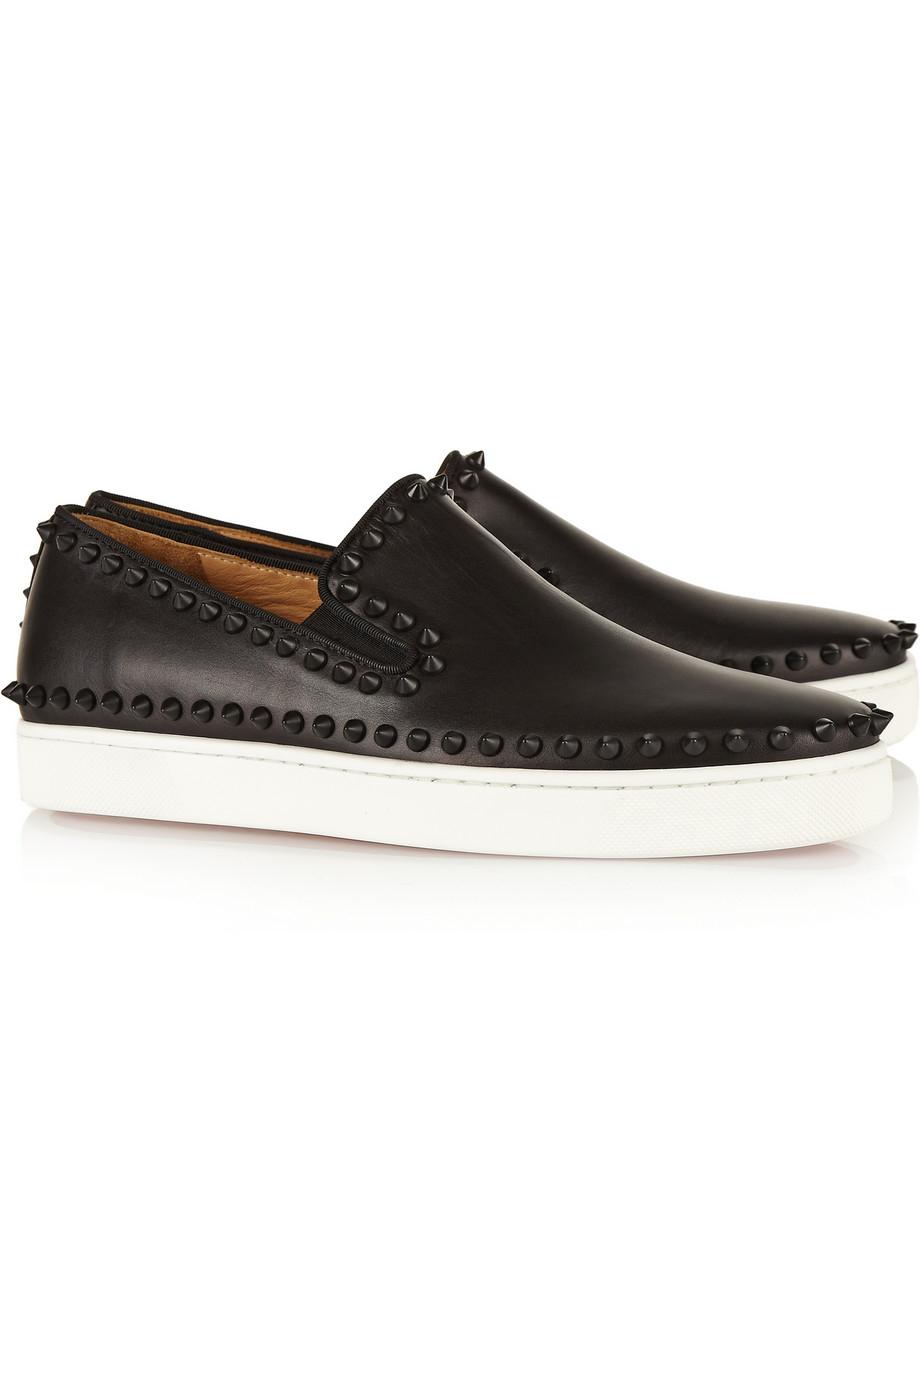 Christian Louboutin Pik Boat Studded Leather Slipon Sneakers in Black